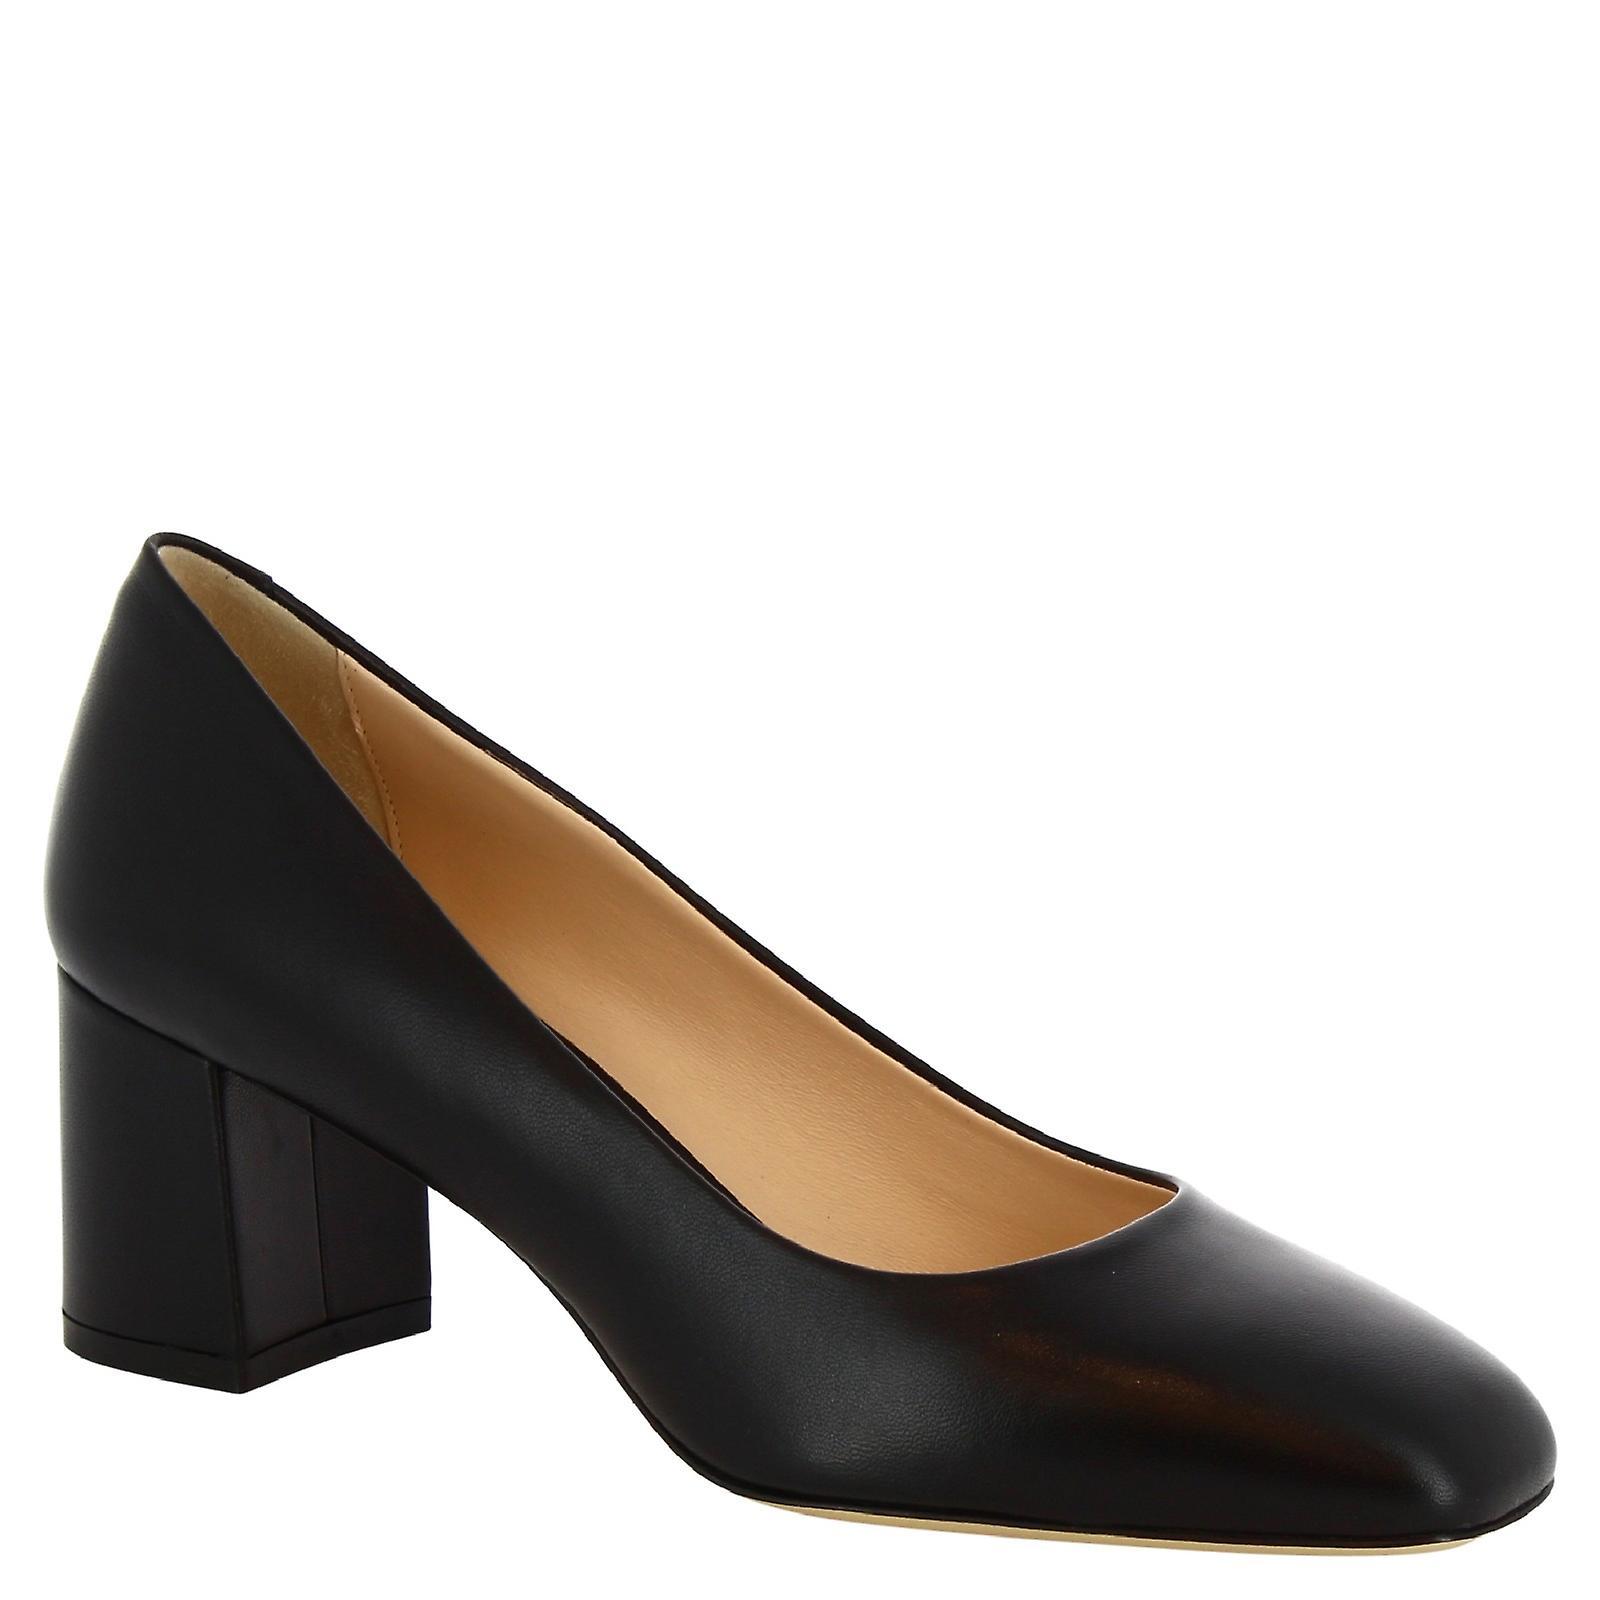 Leonardo Shoes Women's handmade square toe pumps in black calf leather